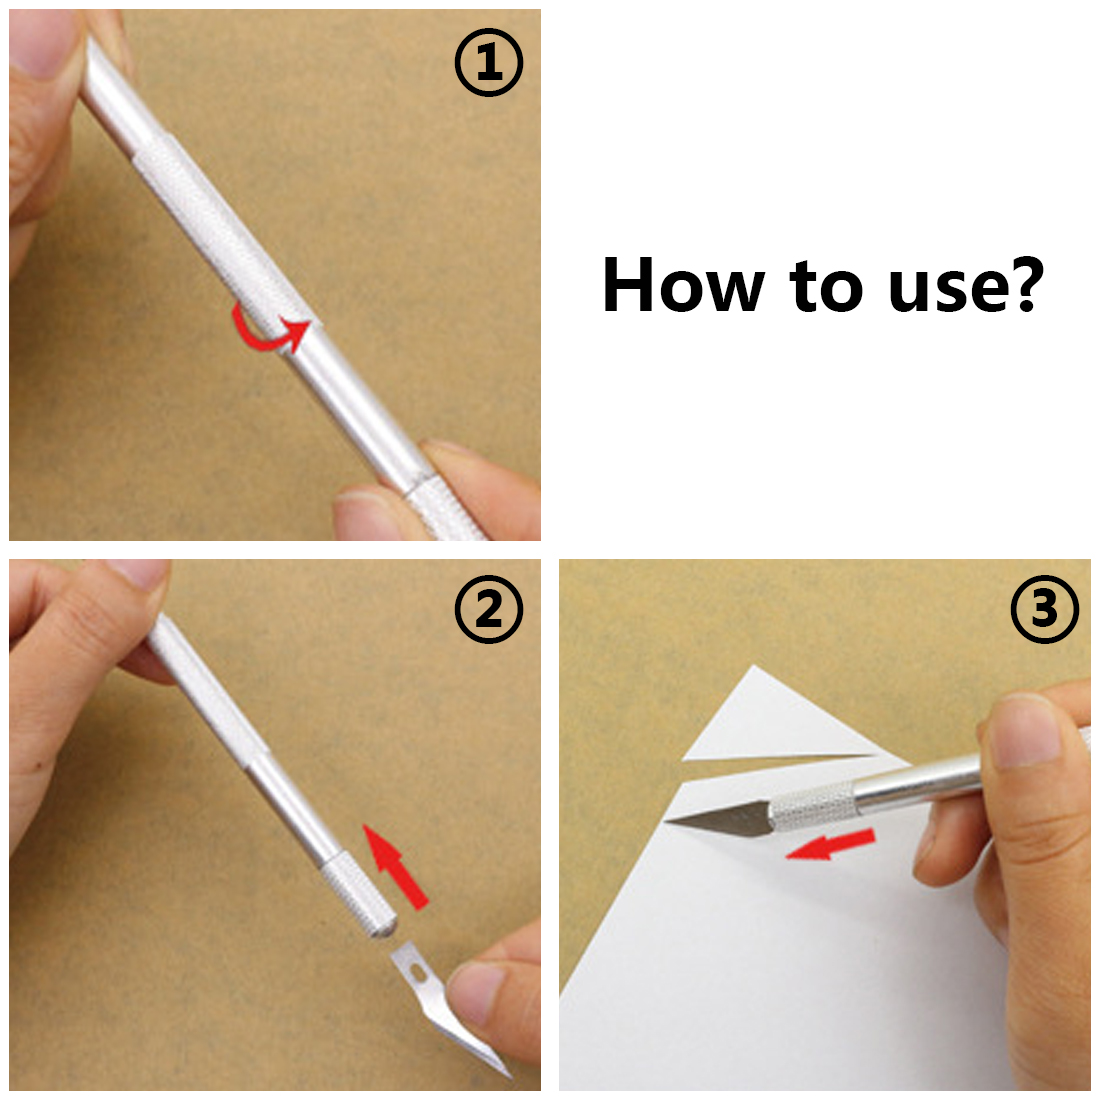 9pcs/set Blades Wood Carving Tools Fruit Food Craft Sculpture Engraving Knife Scalpel DIY Cutting Tool Repair Hand Tool Sets 2